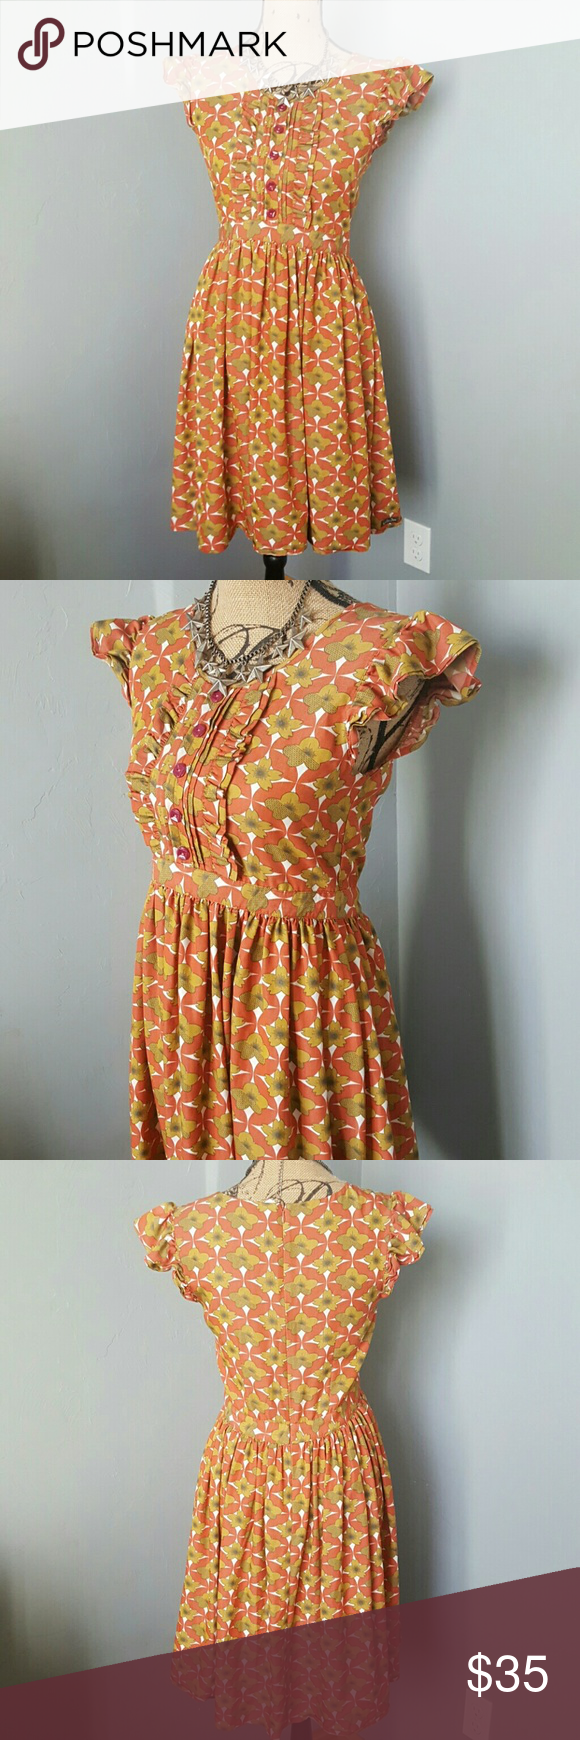 Matilda Jane Anthropologie Floral Dresz In great condition. Soft cotton. Floral patterned dress. Anthropologie  Dresses